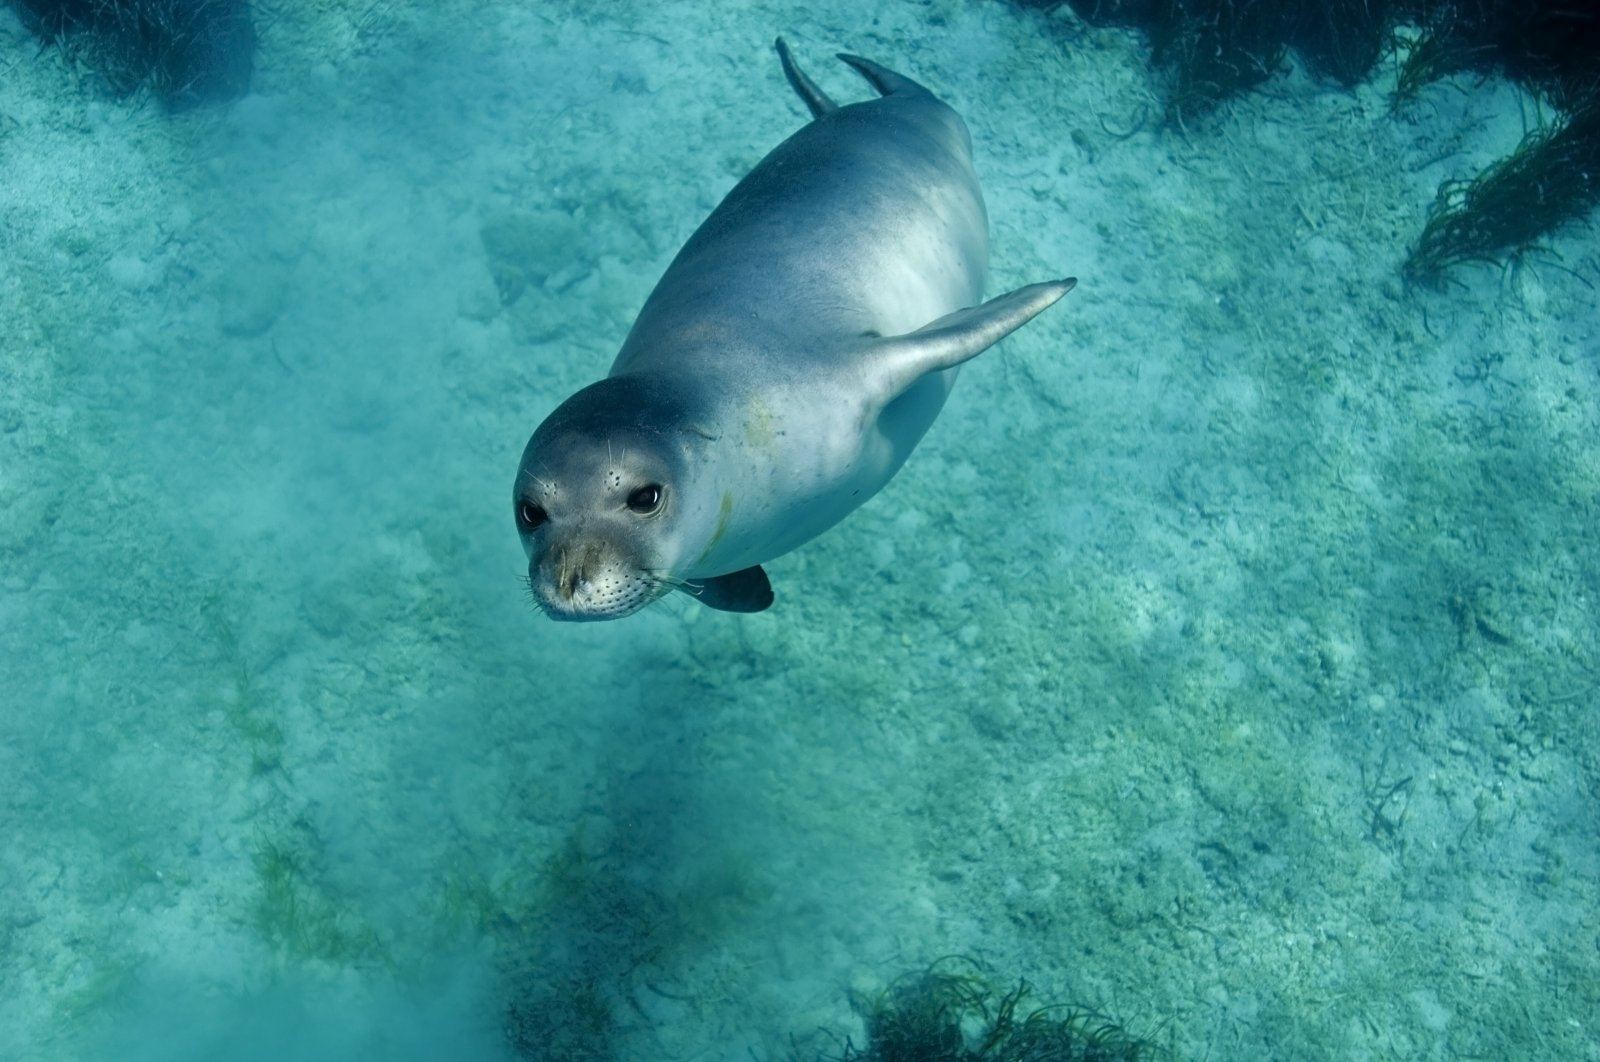 A Mediterranean monk seal dives into the water, Gökova, Turkey. (Shutterstock Photo)